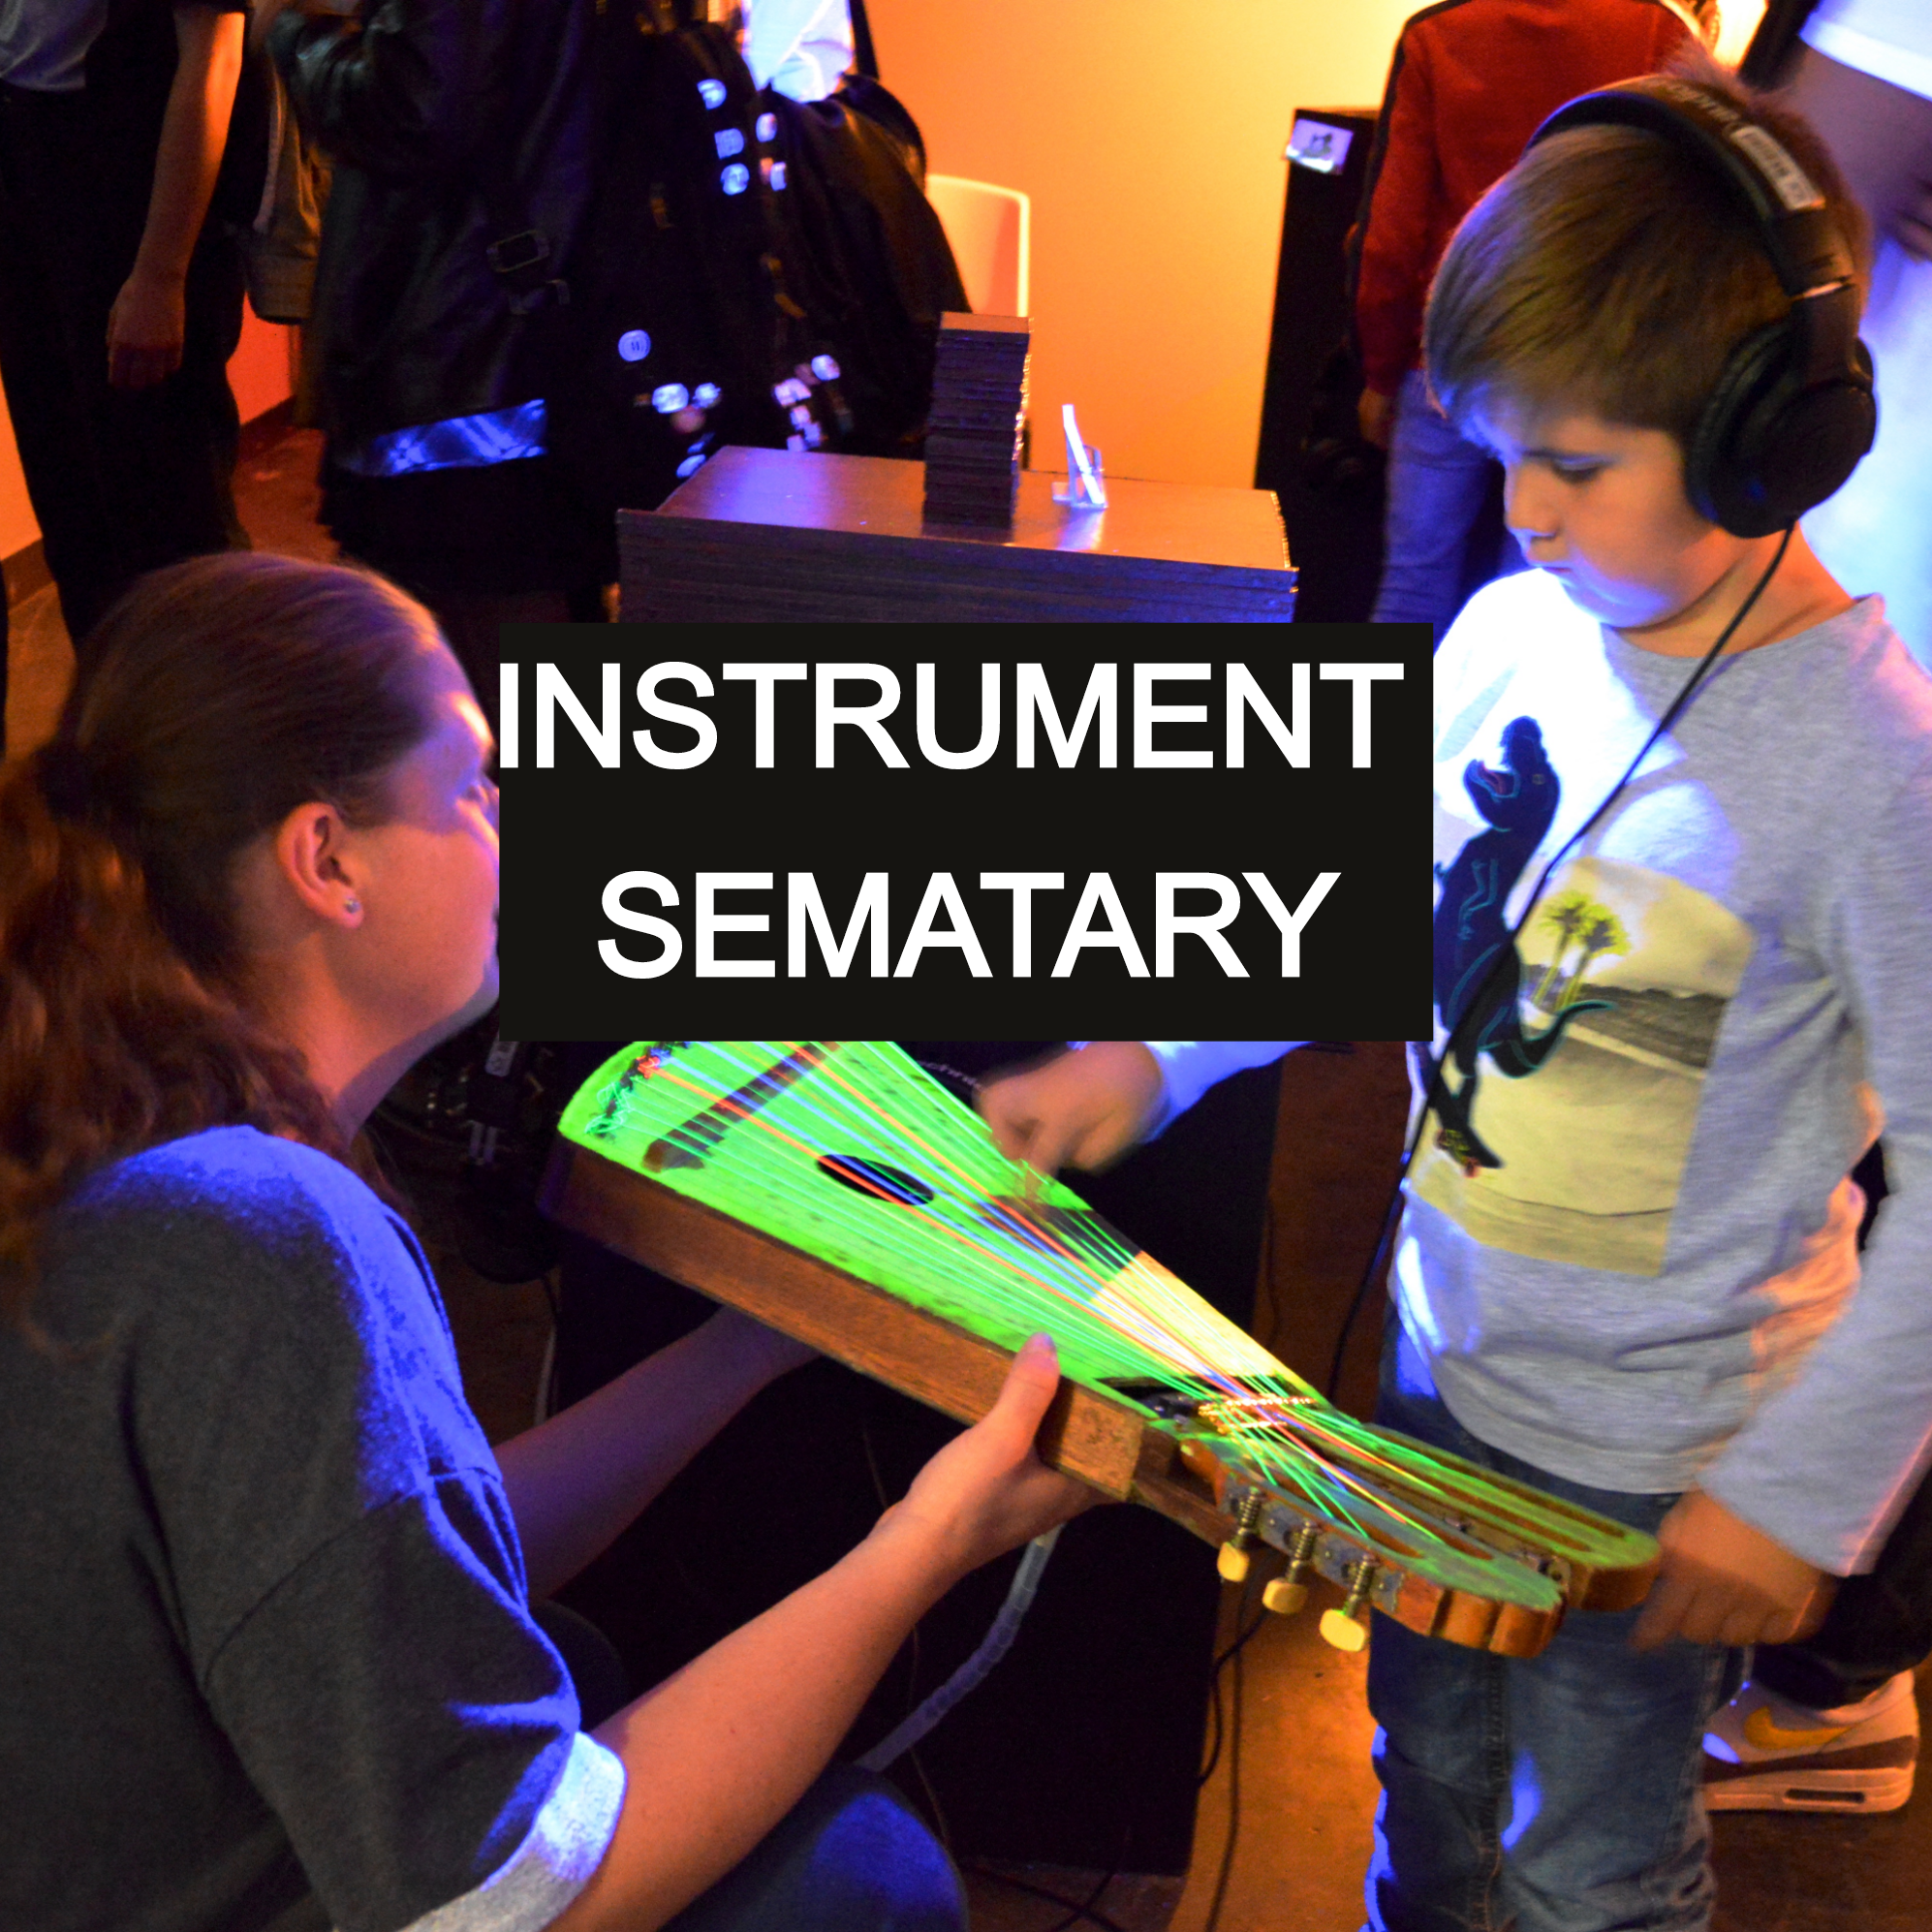 Kid_InstrumentSematary_edited